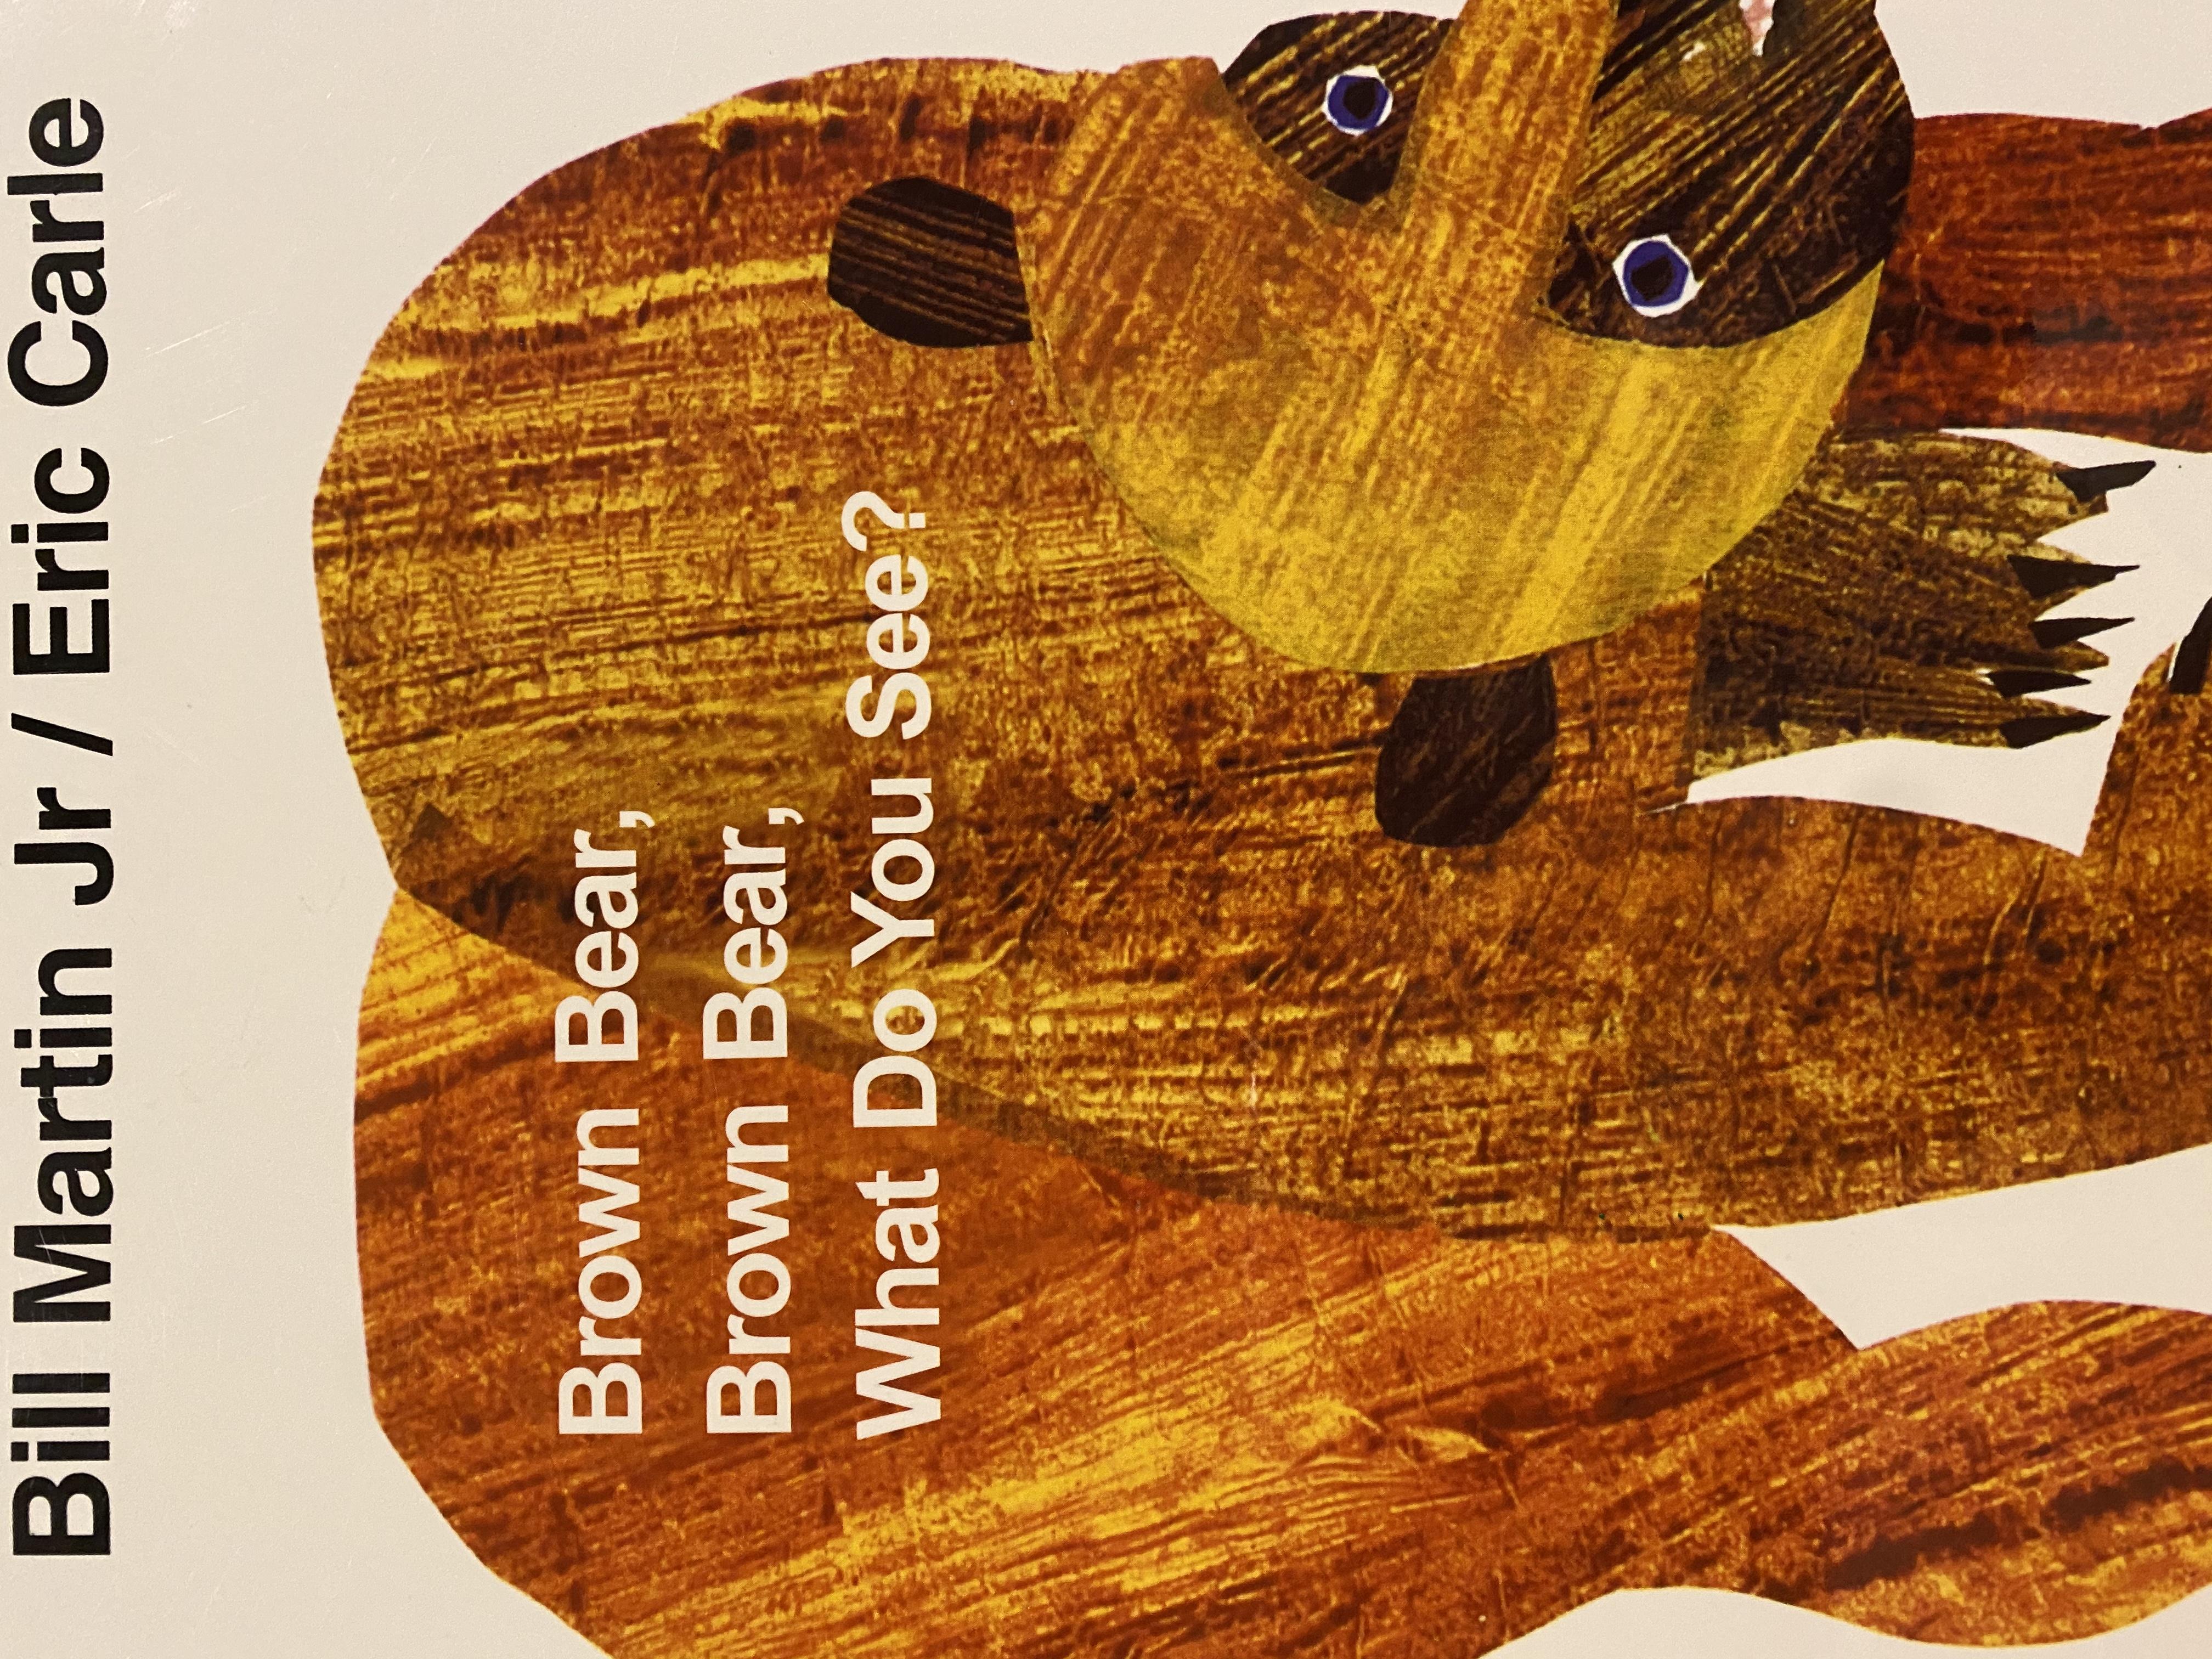 S2-044/ Brown bear, brown bear, what do you see?/ Bill Martin Jr. & Eric Carle/ Puffin books/ 廖采杏老師100本